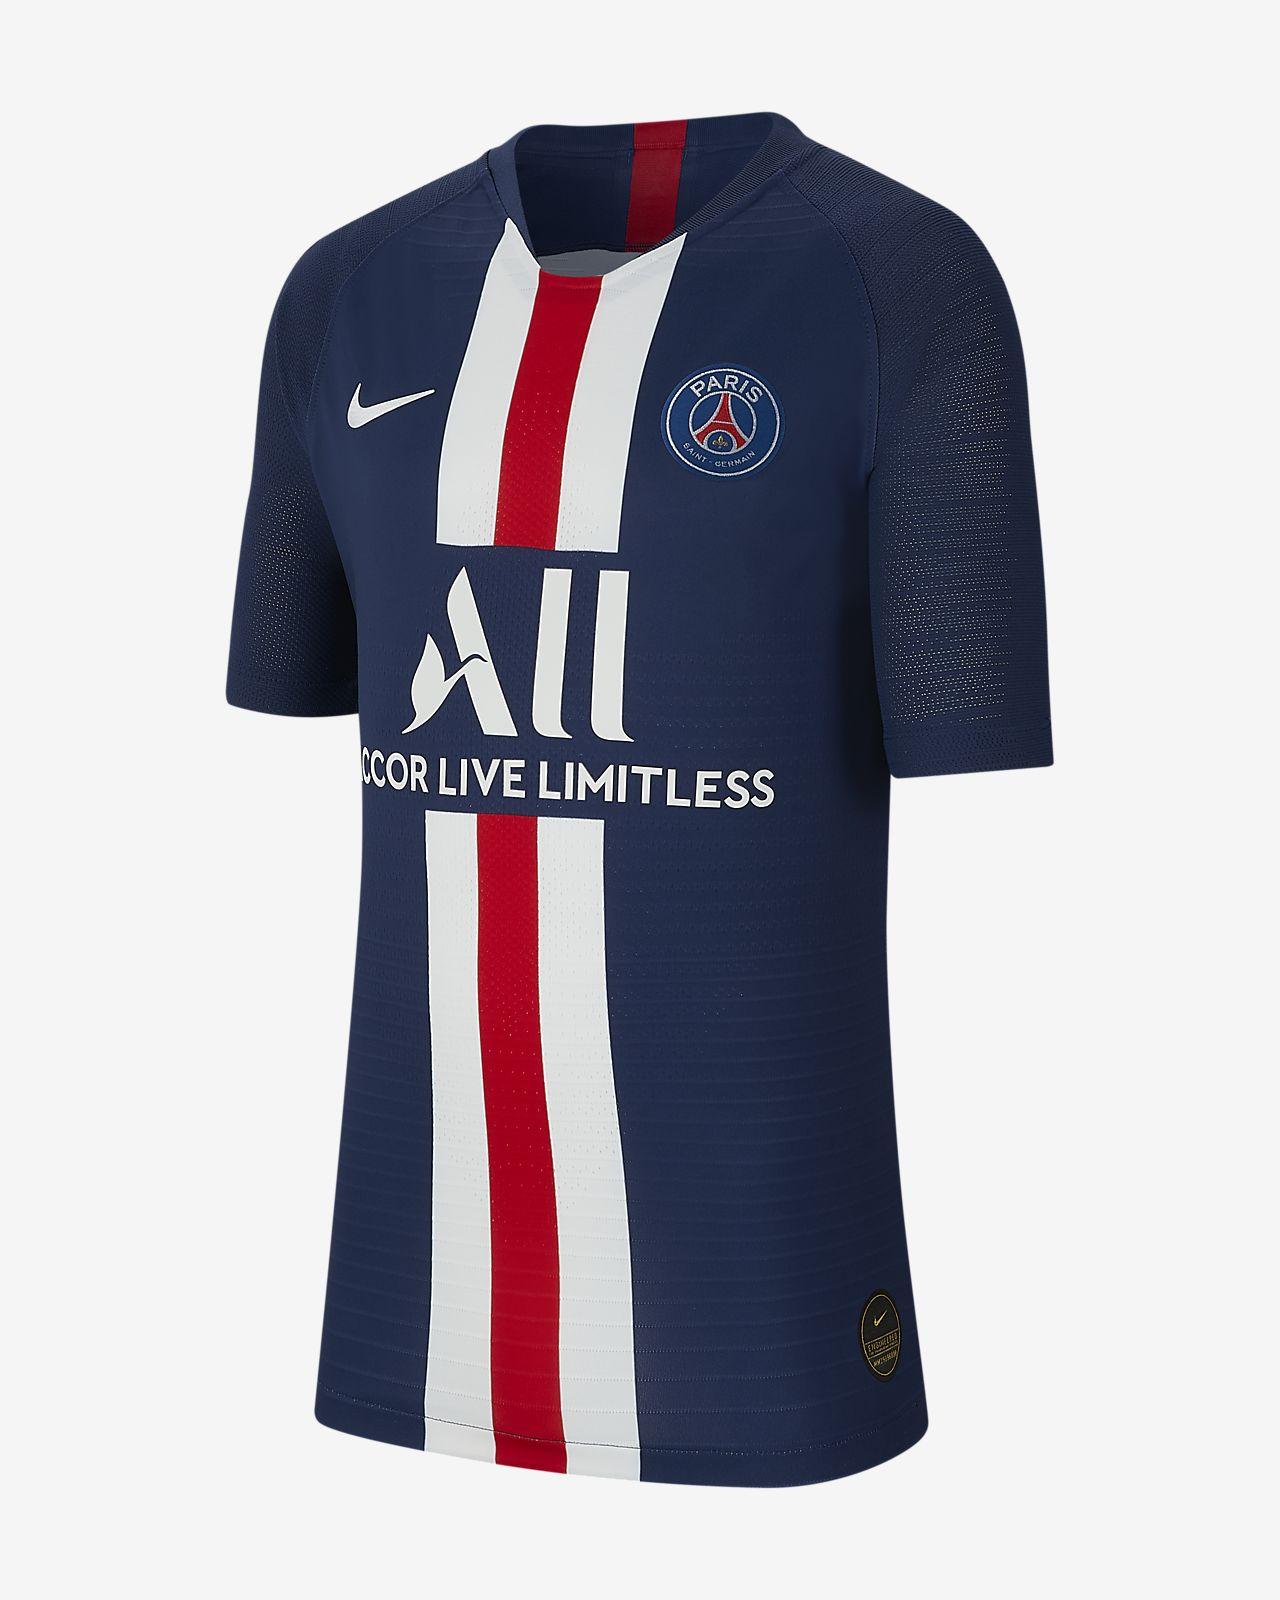 Paris Saint-Germain 2019/20 Vapor Match hjemmedrakt til store barn